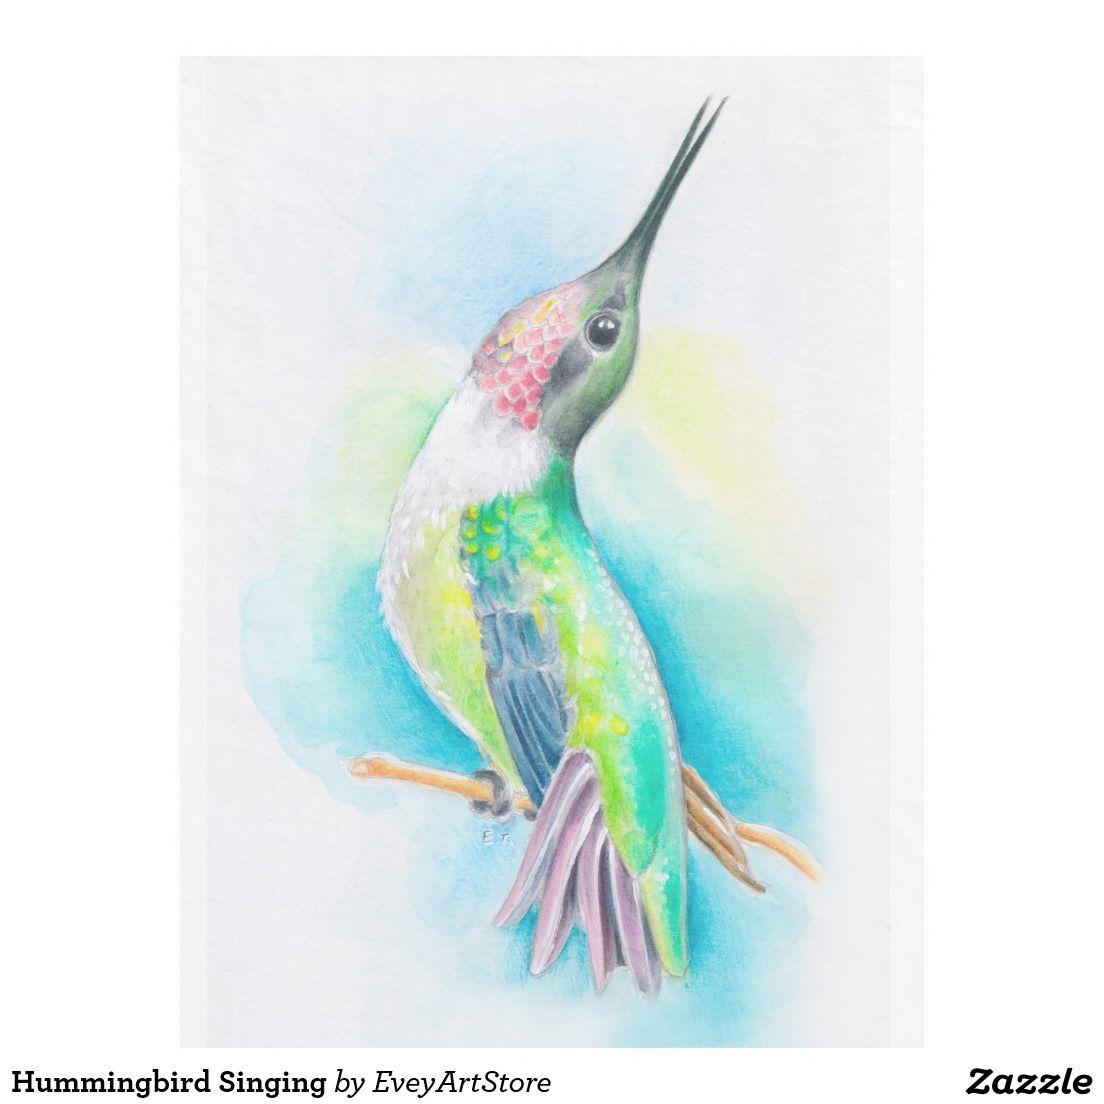 Hummingbird Singing Fleece Blanket Hummingbird and Blanket